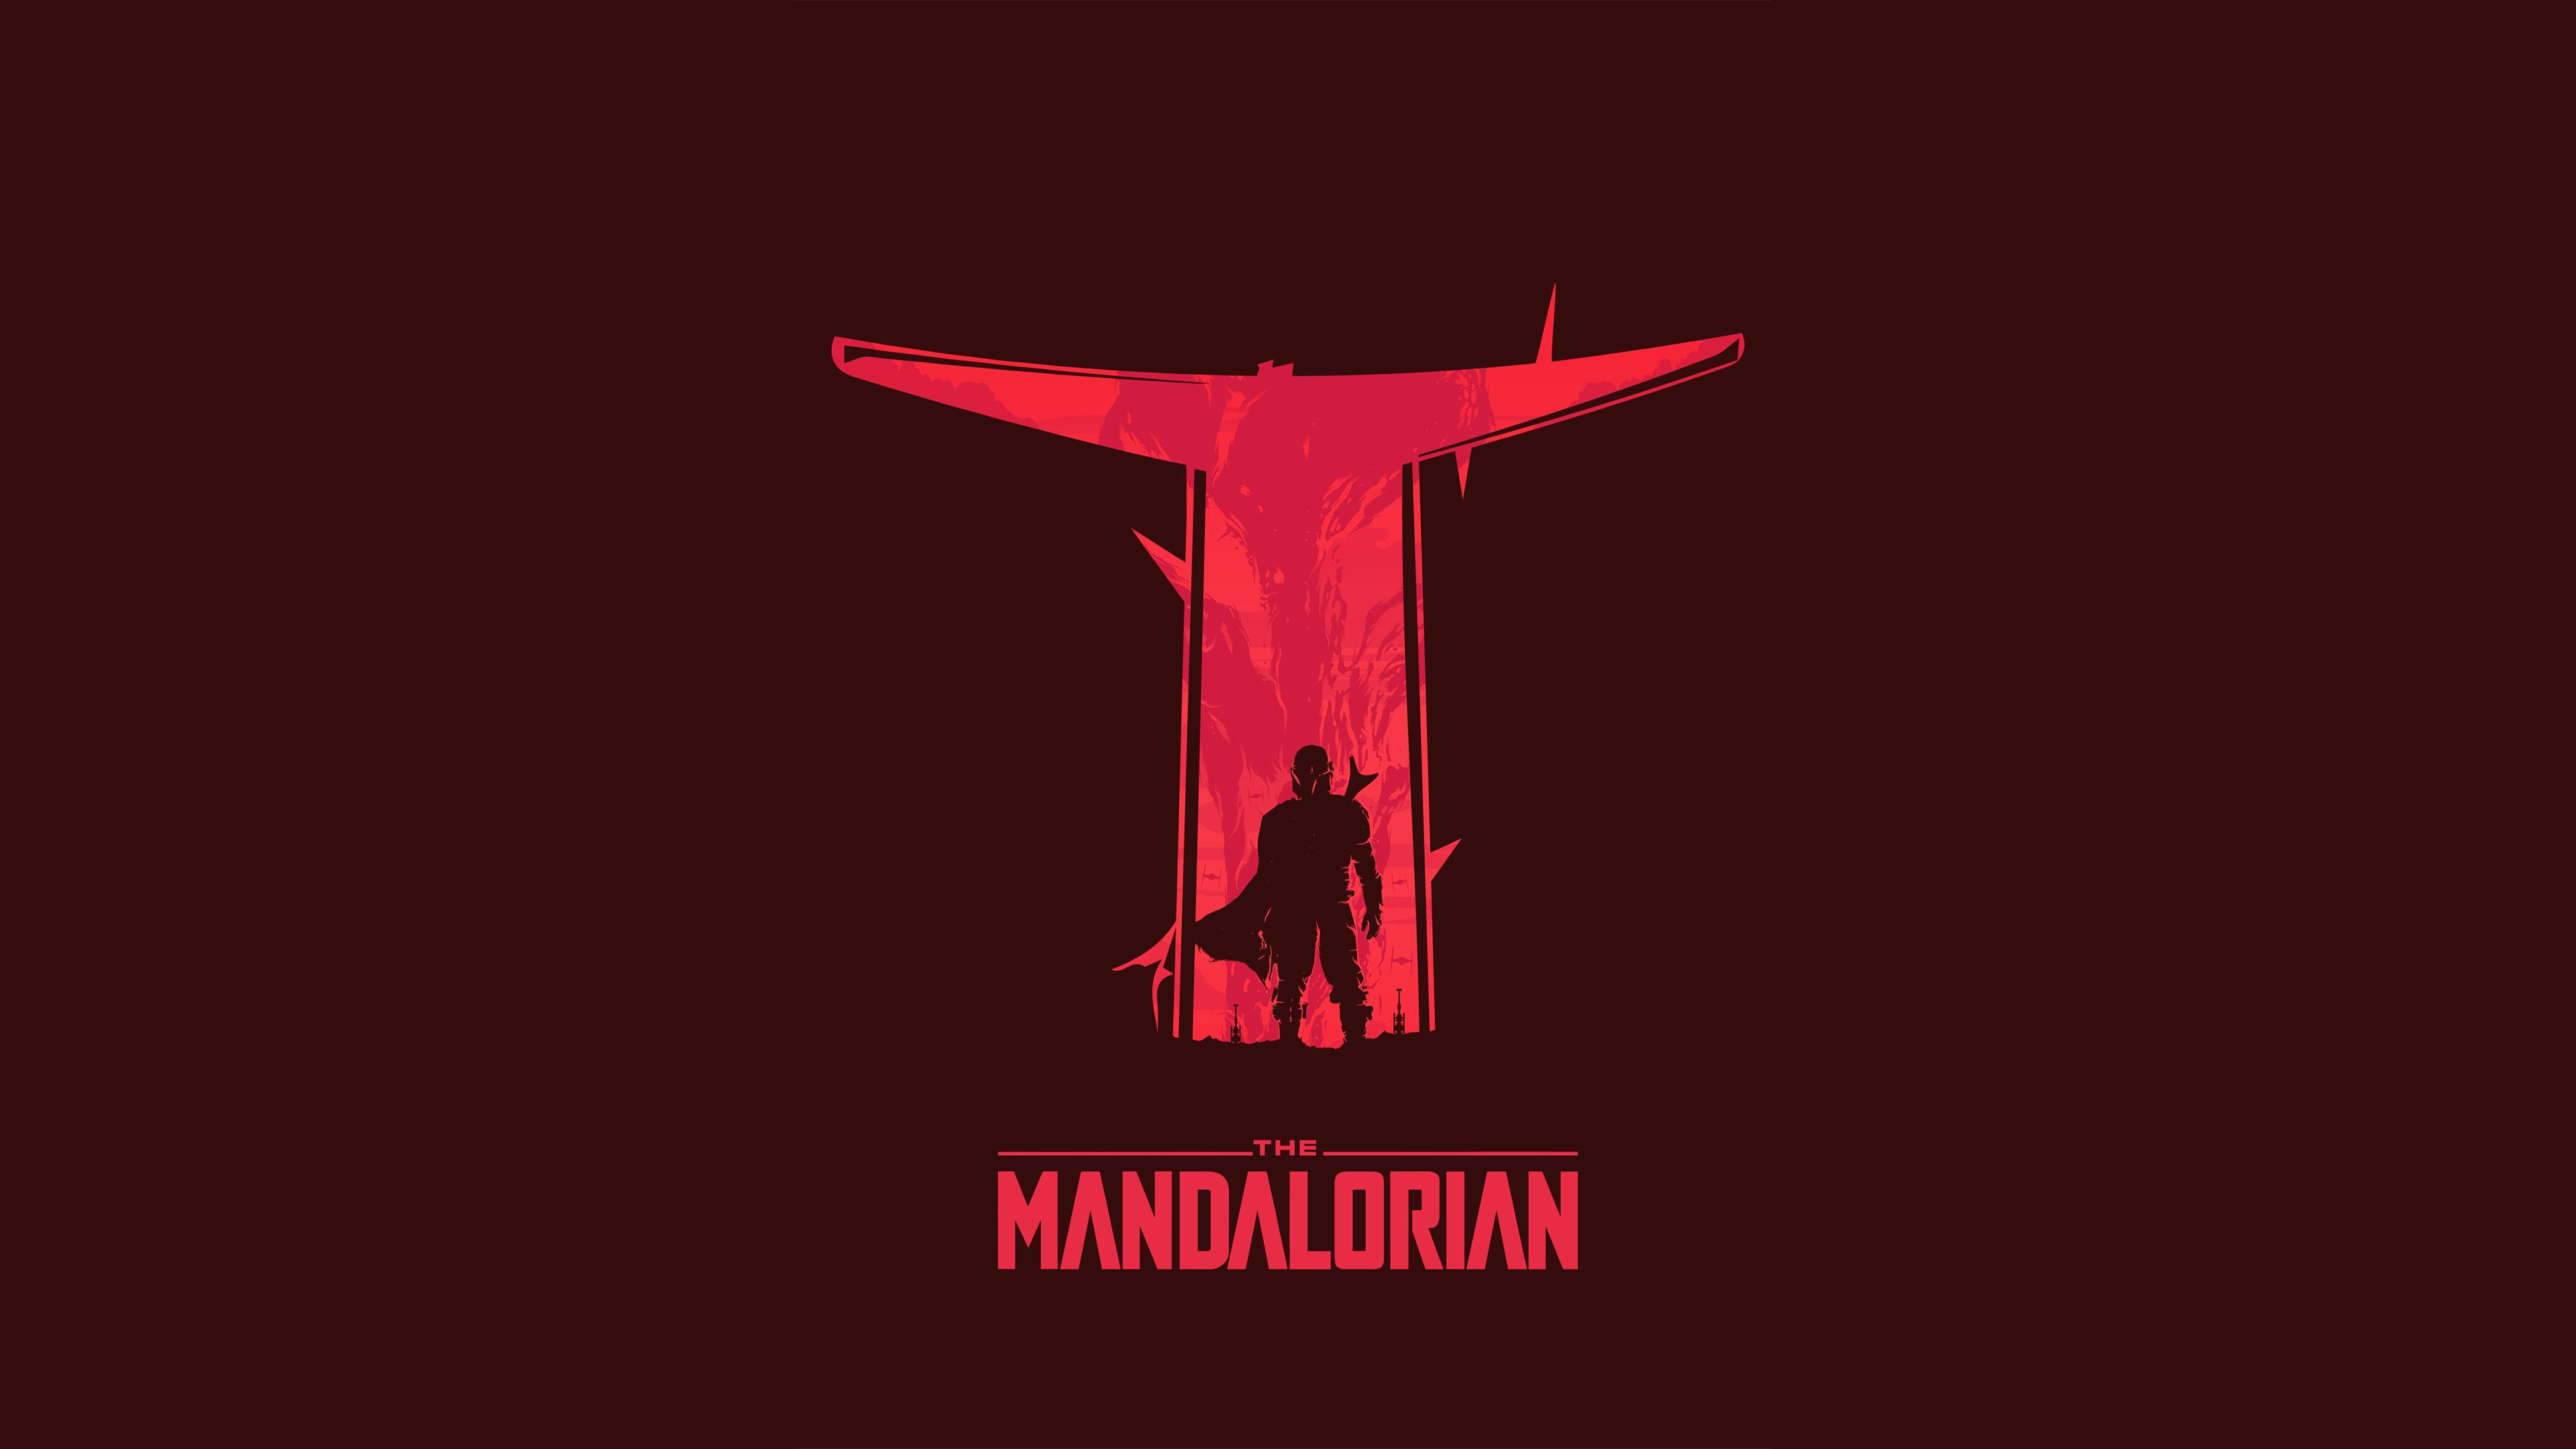 The Mandalorian Minimalist Wallpaper